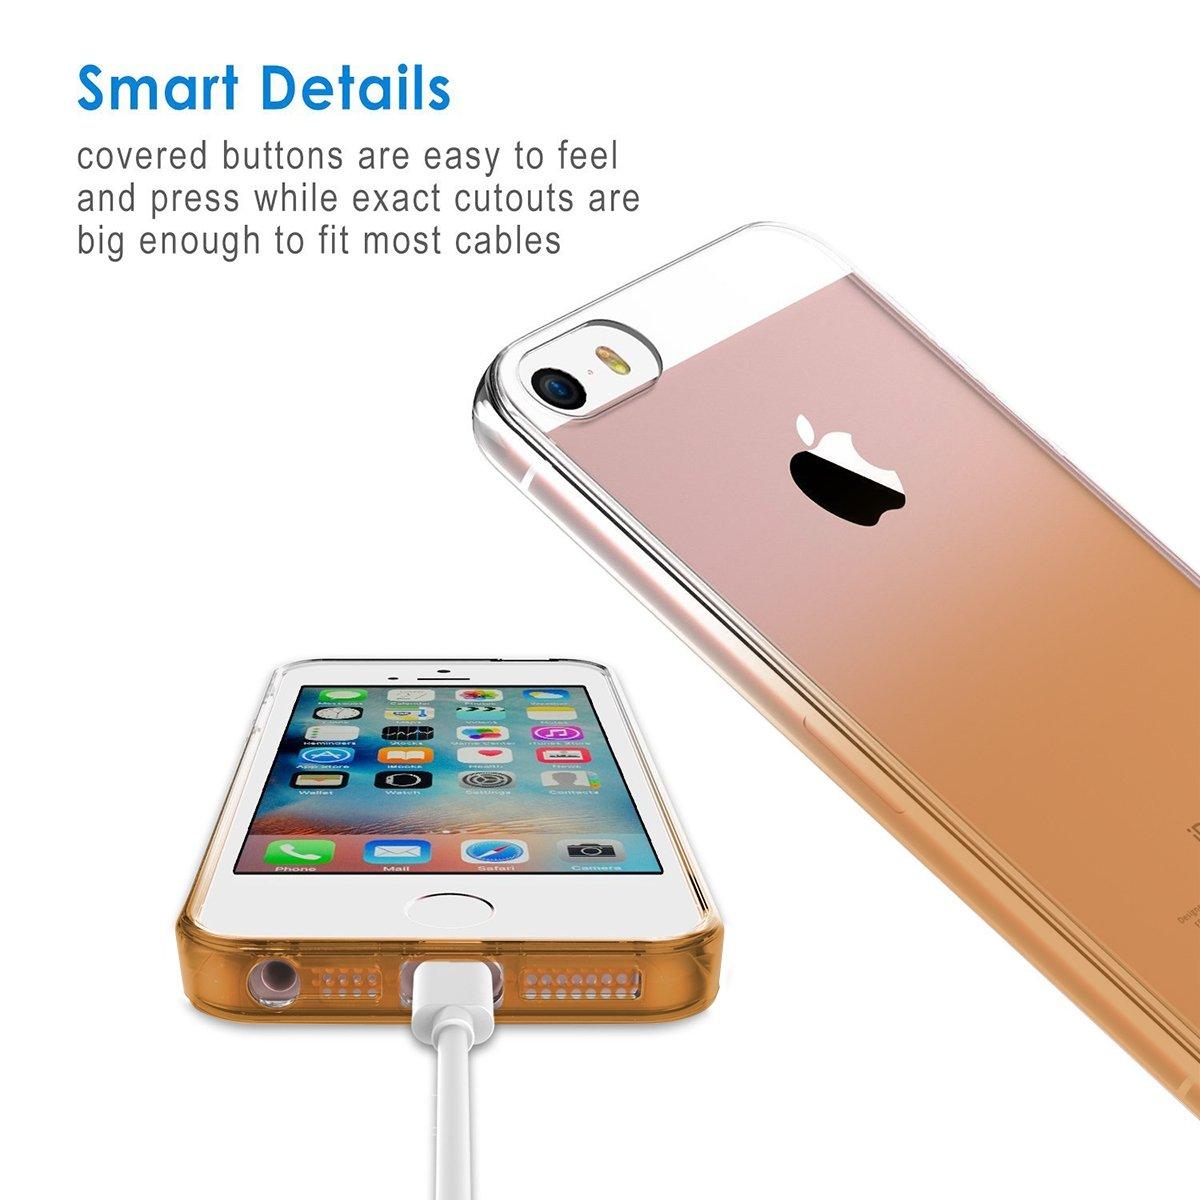 Ốp lưng iPhone SE / iPhone 5/5s, Tuxedo Cocktail (TPU cao cấp, trong suốt, mềm mại, chống va đập)